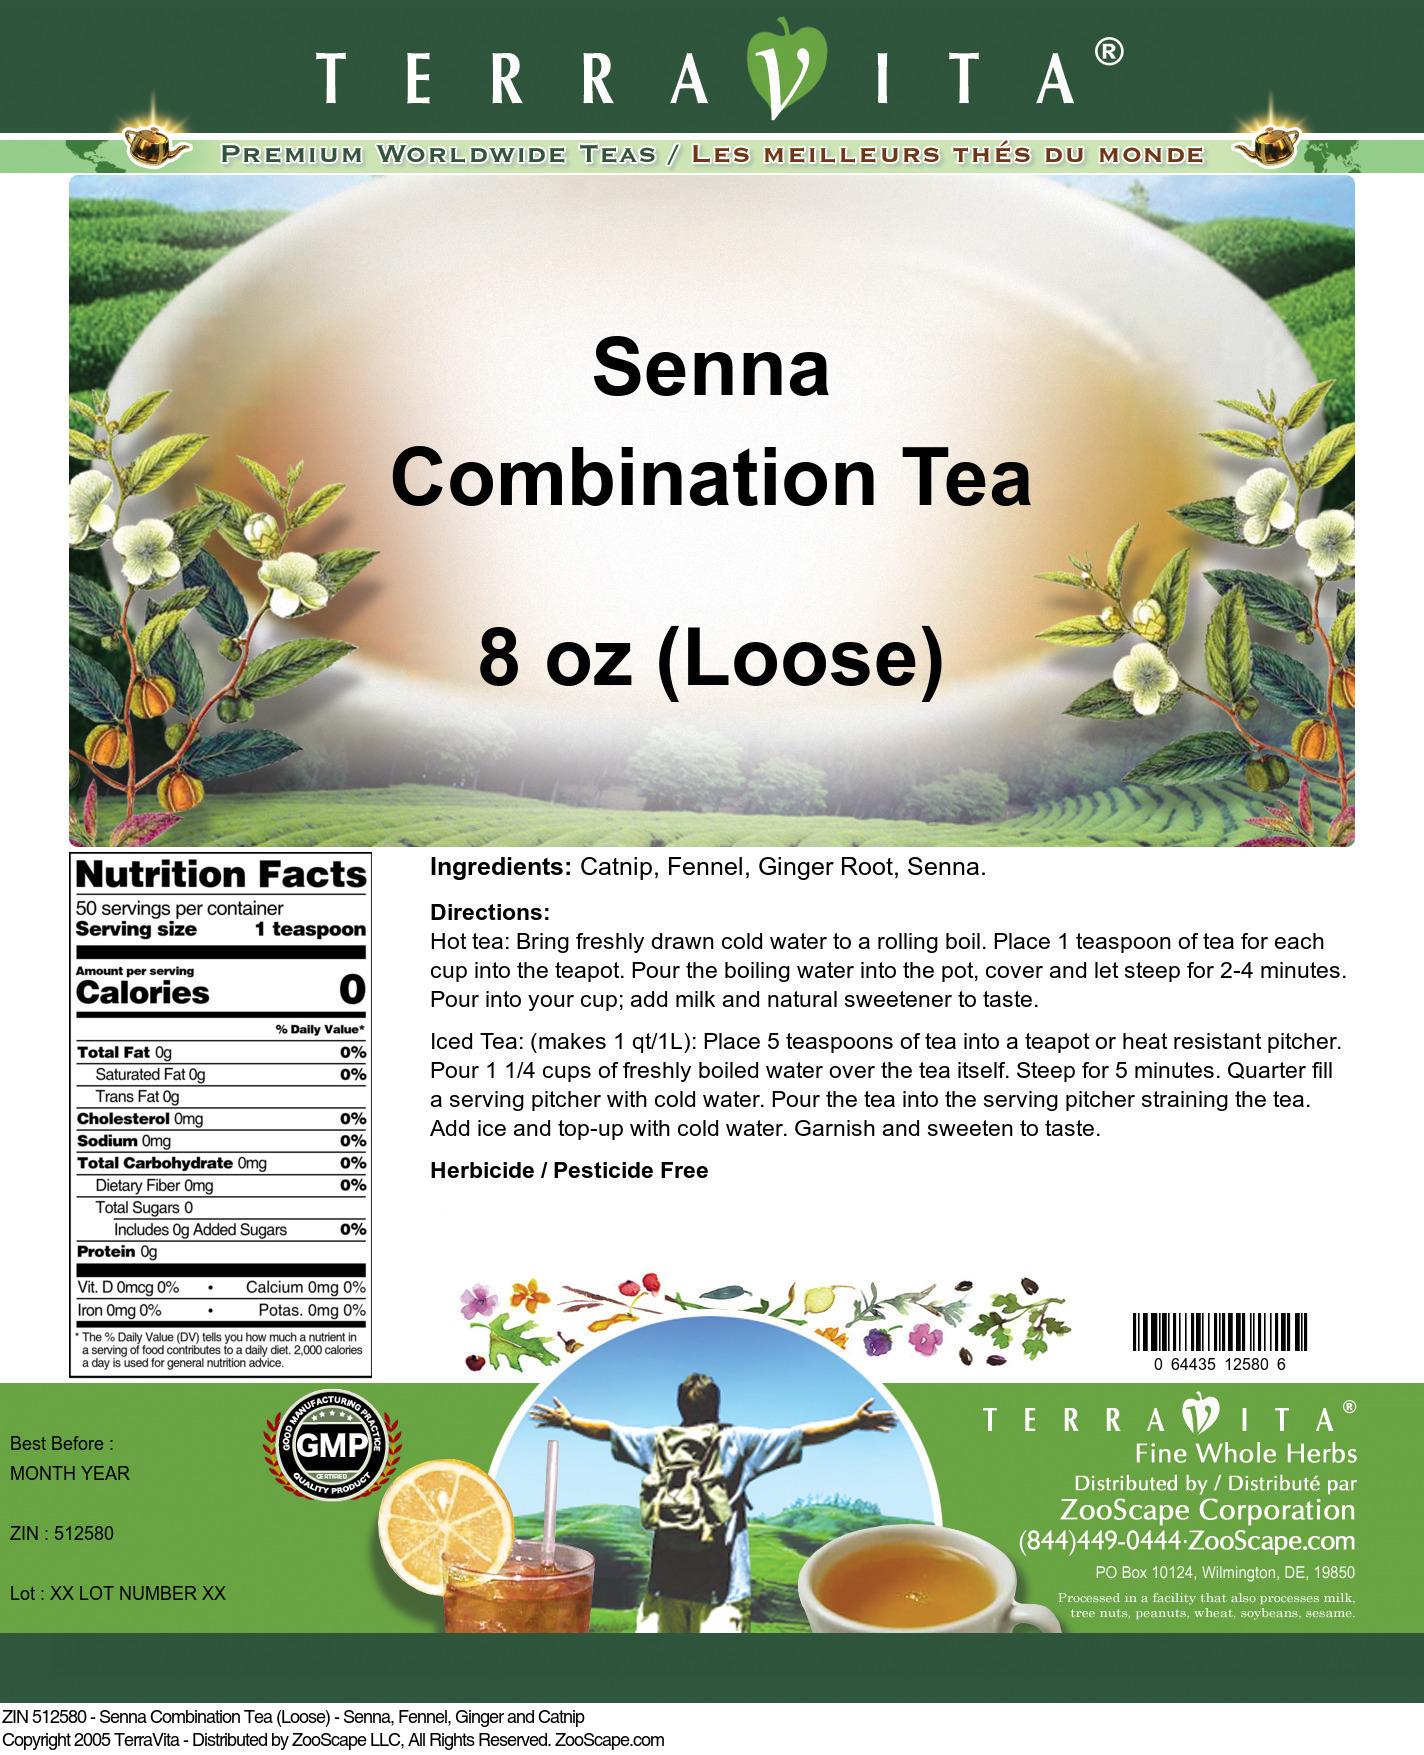 Senna Combination Tea (Loose) - Senna, Fennel, Ginger and Catnip